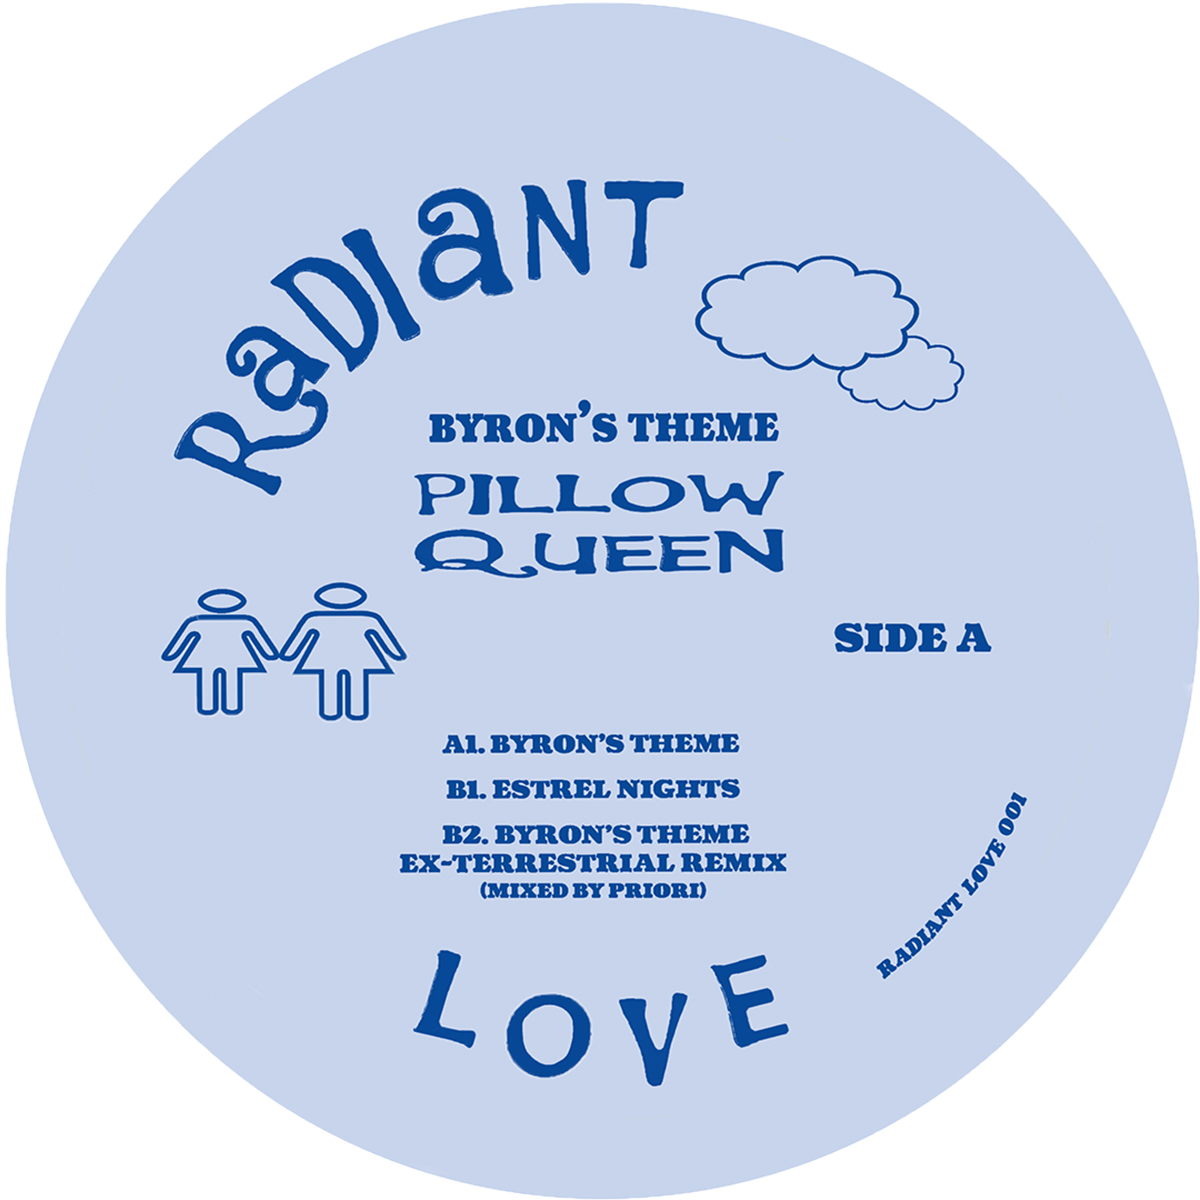 Pillow Queen (aka D Tiffany & Vani-T) - Byrons Theme w/ Ex-Terrestial Remix